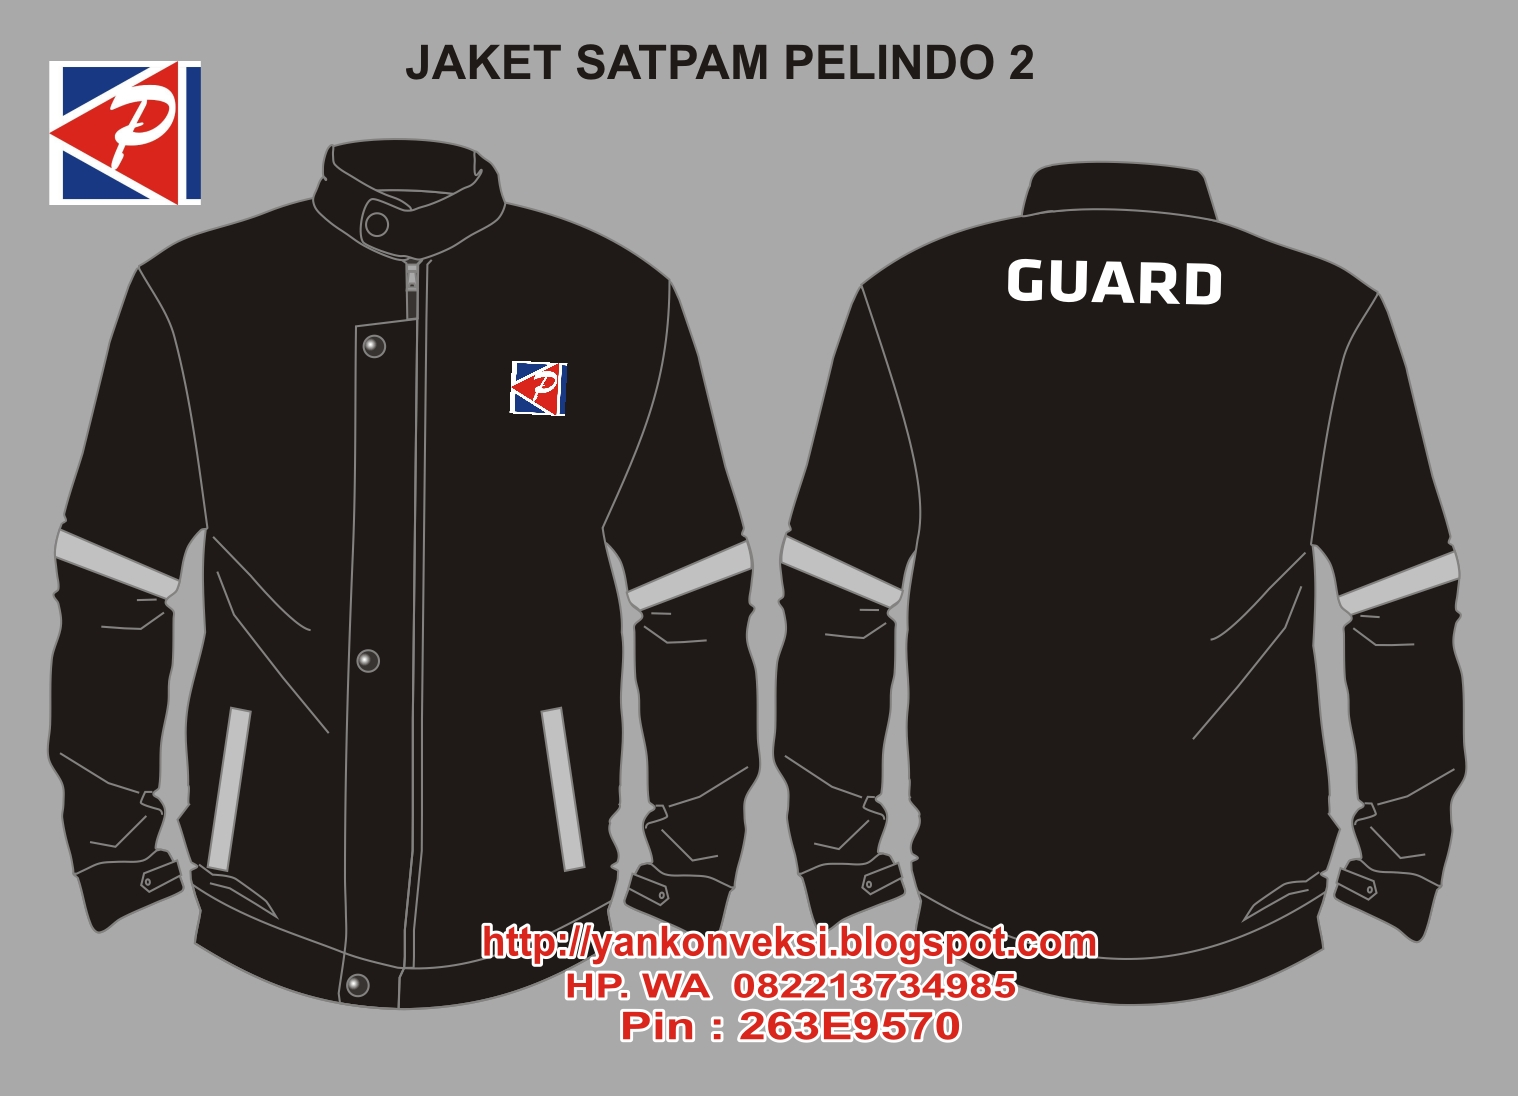 JAKET PESANAN SECURITY PELINDO 2